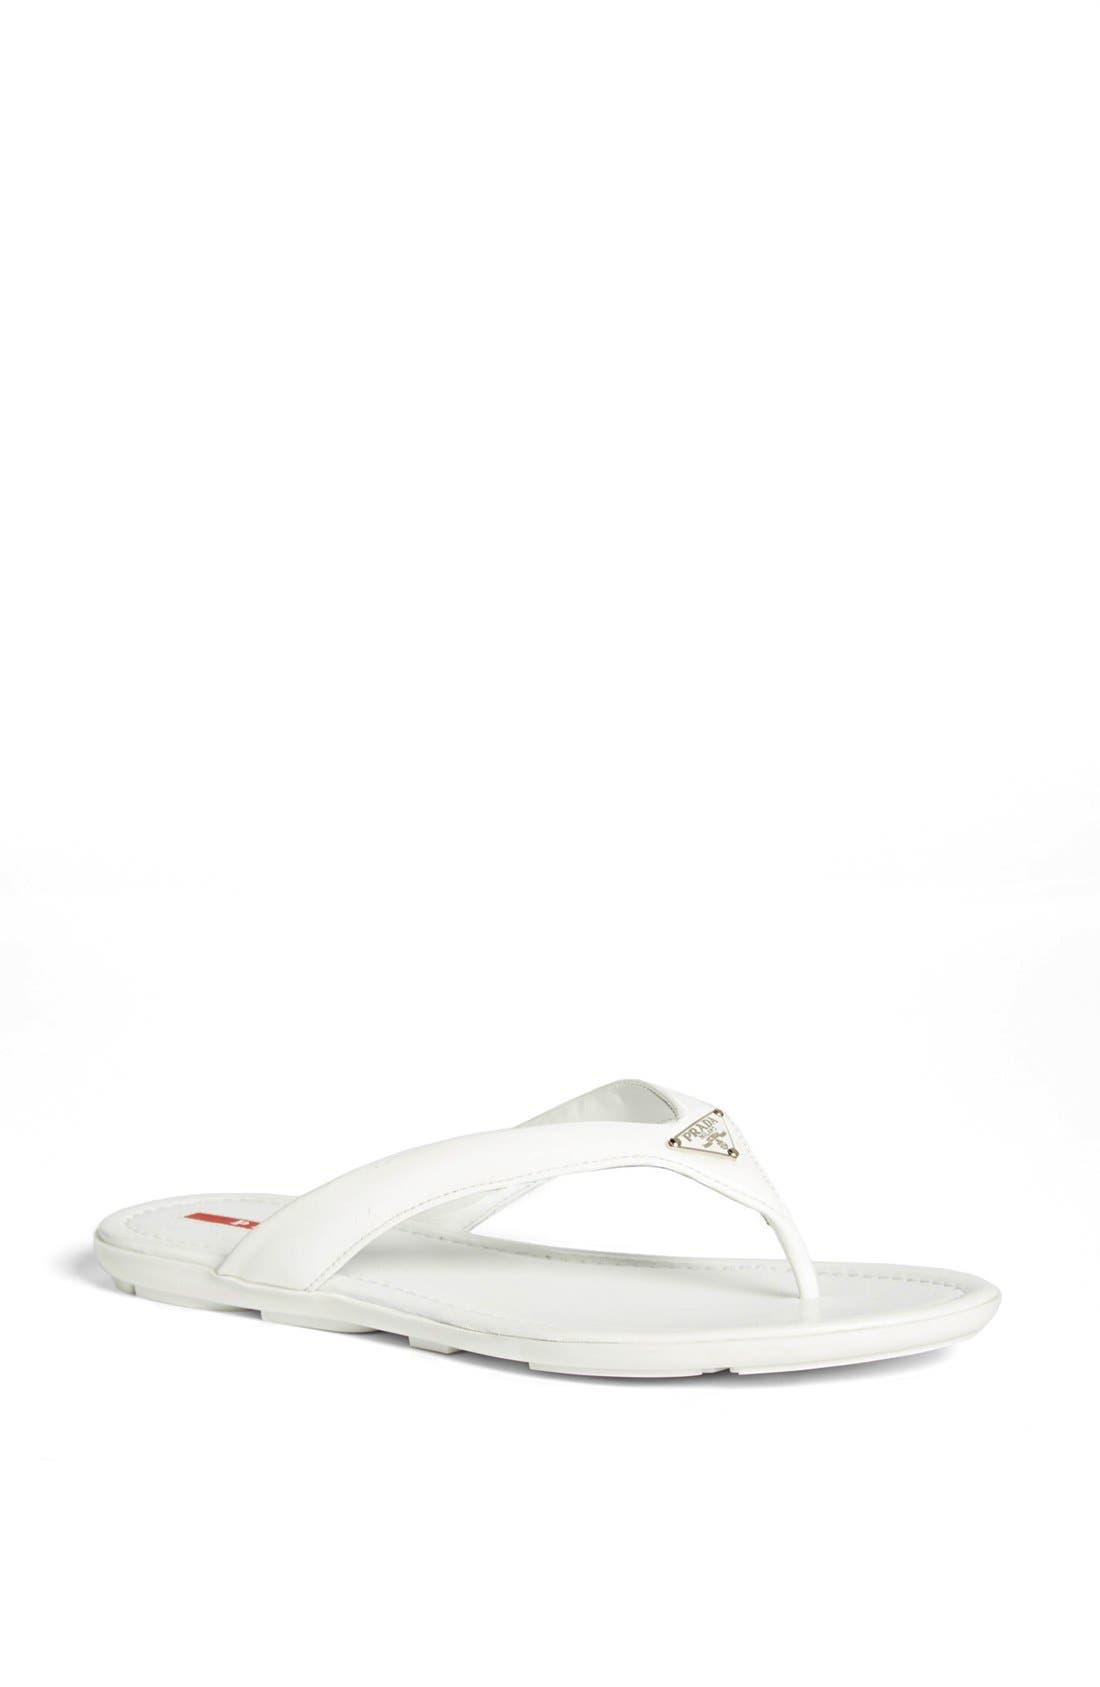 Alternate Image 1 Selected - Prada Logo Thong Sandal